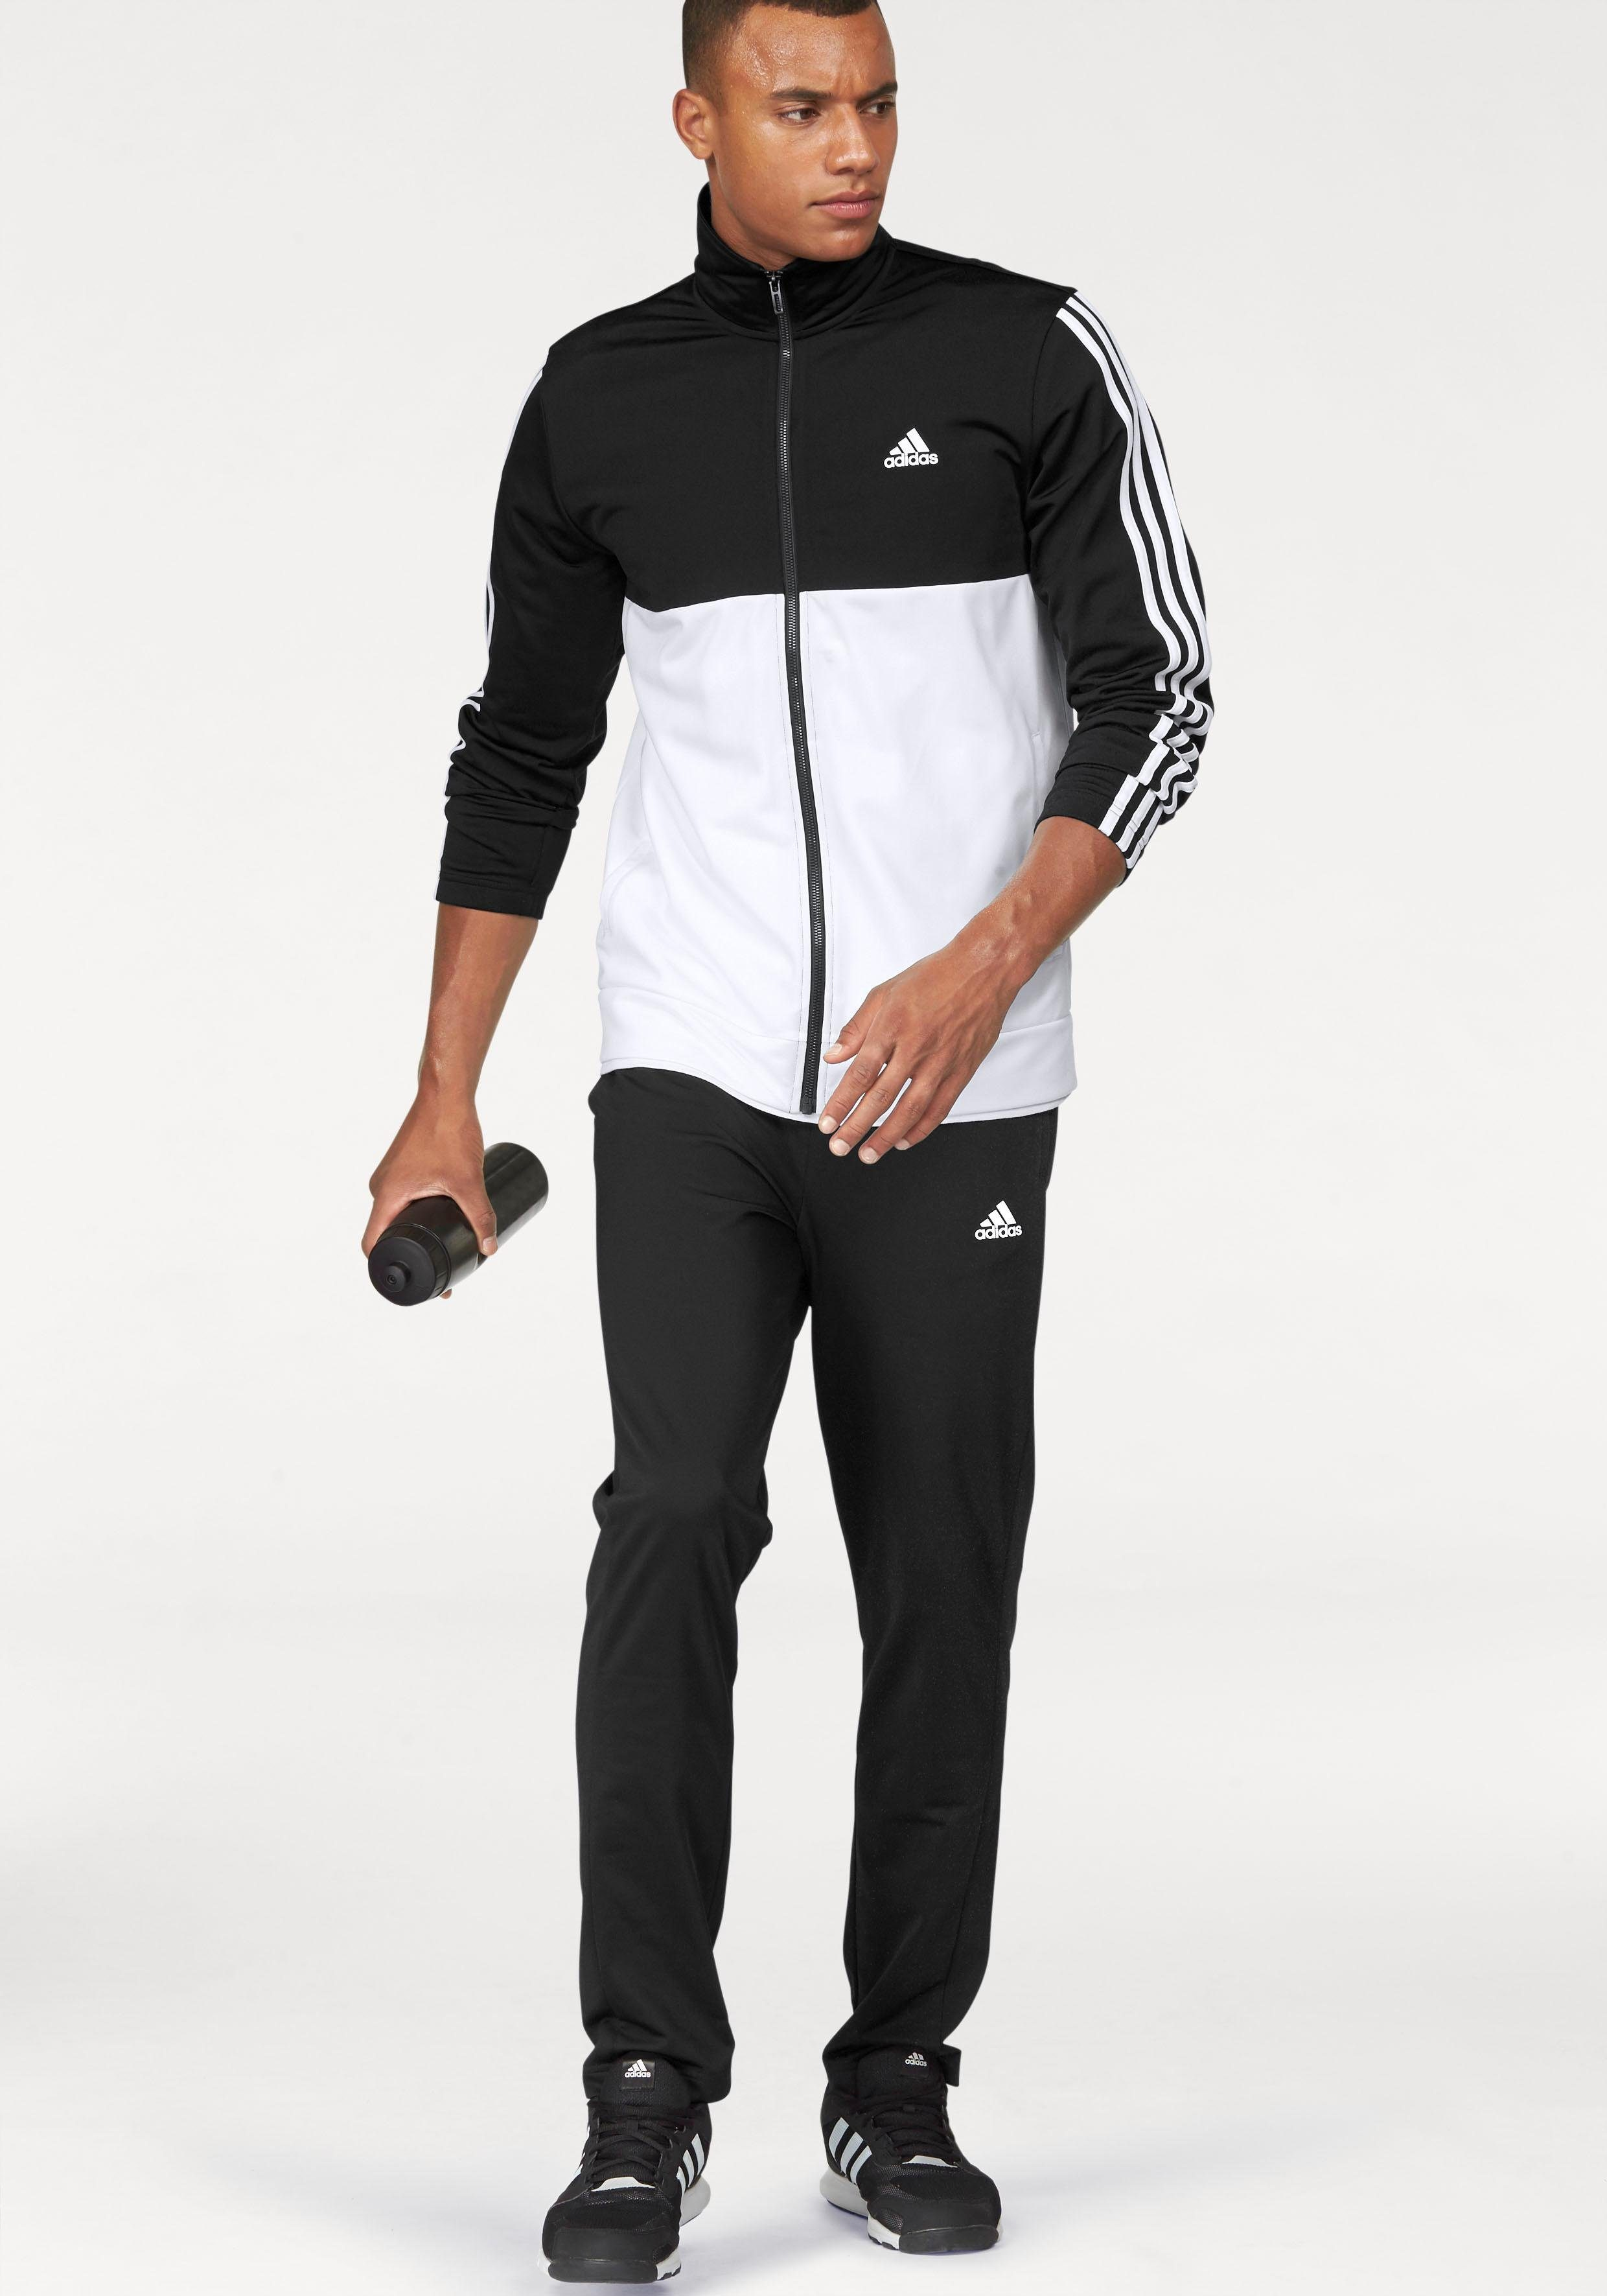 adidas Performance Trainingsanzug PES COSY TS schwarz weiß